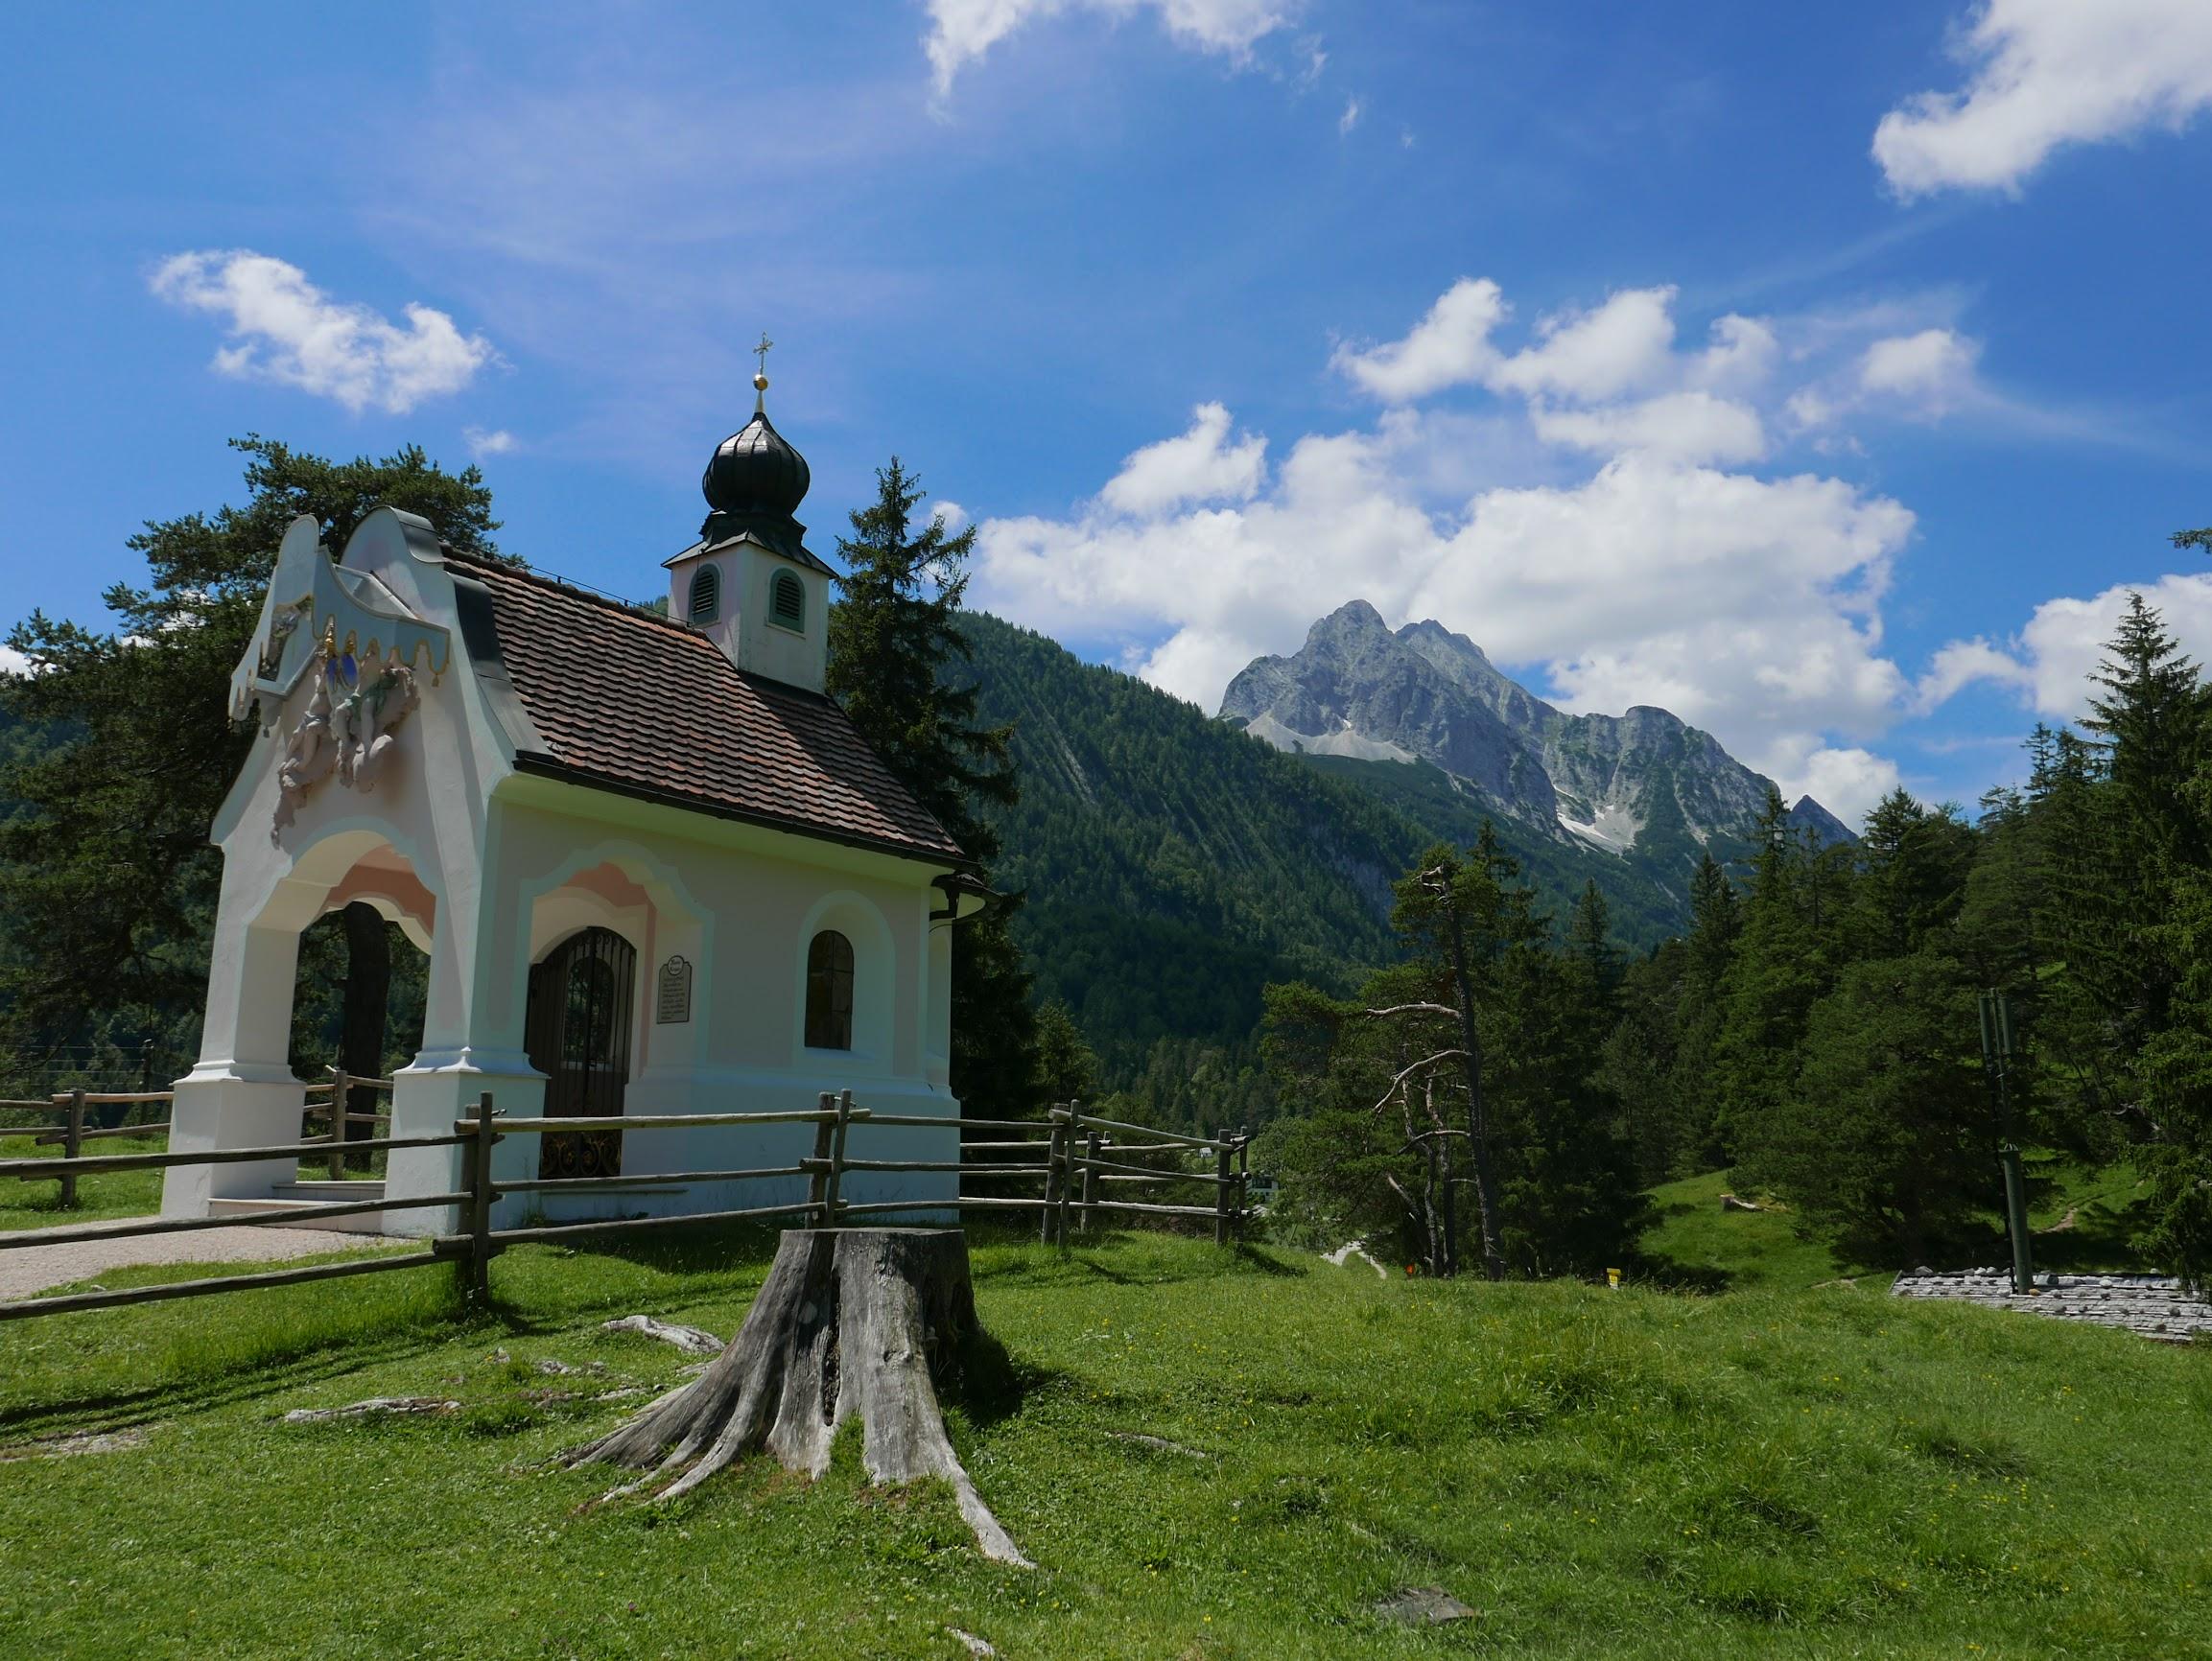 Kapelle Maria Königin, Mittenwald, Germany